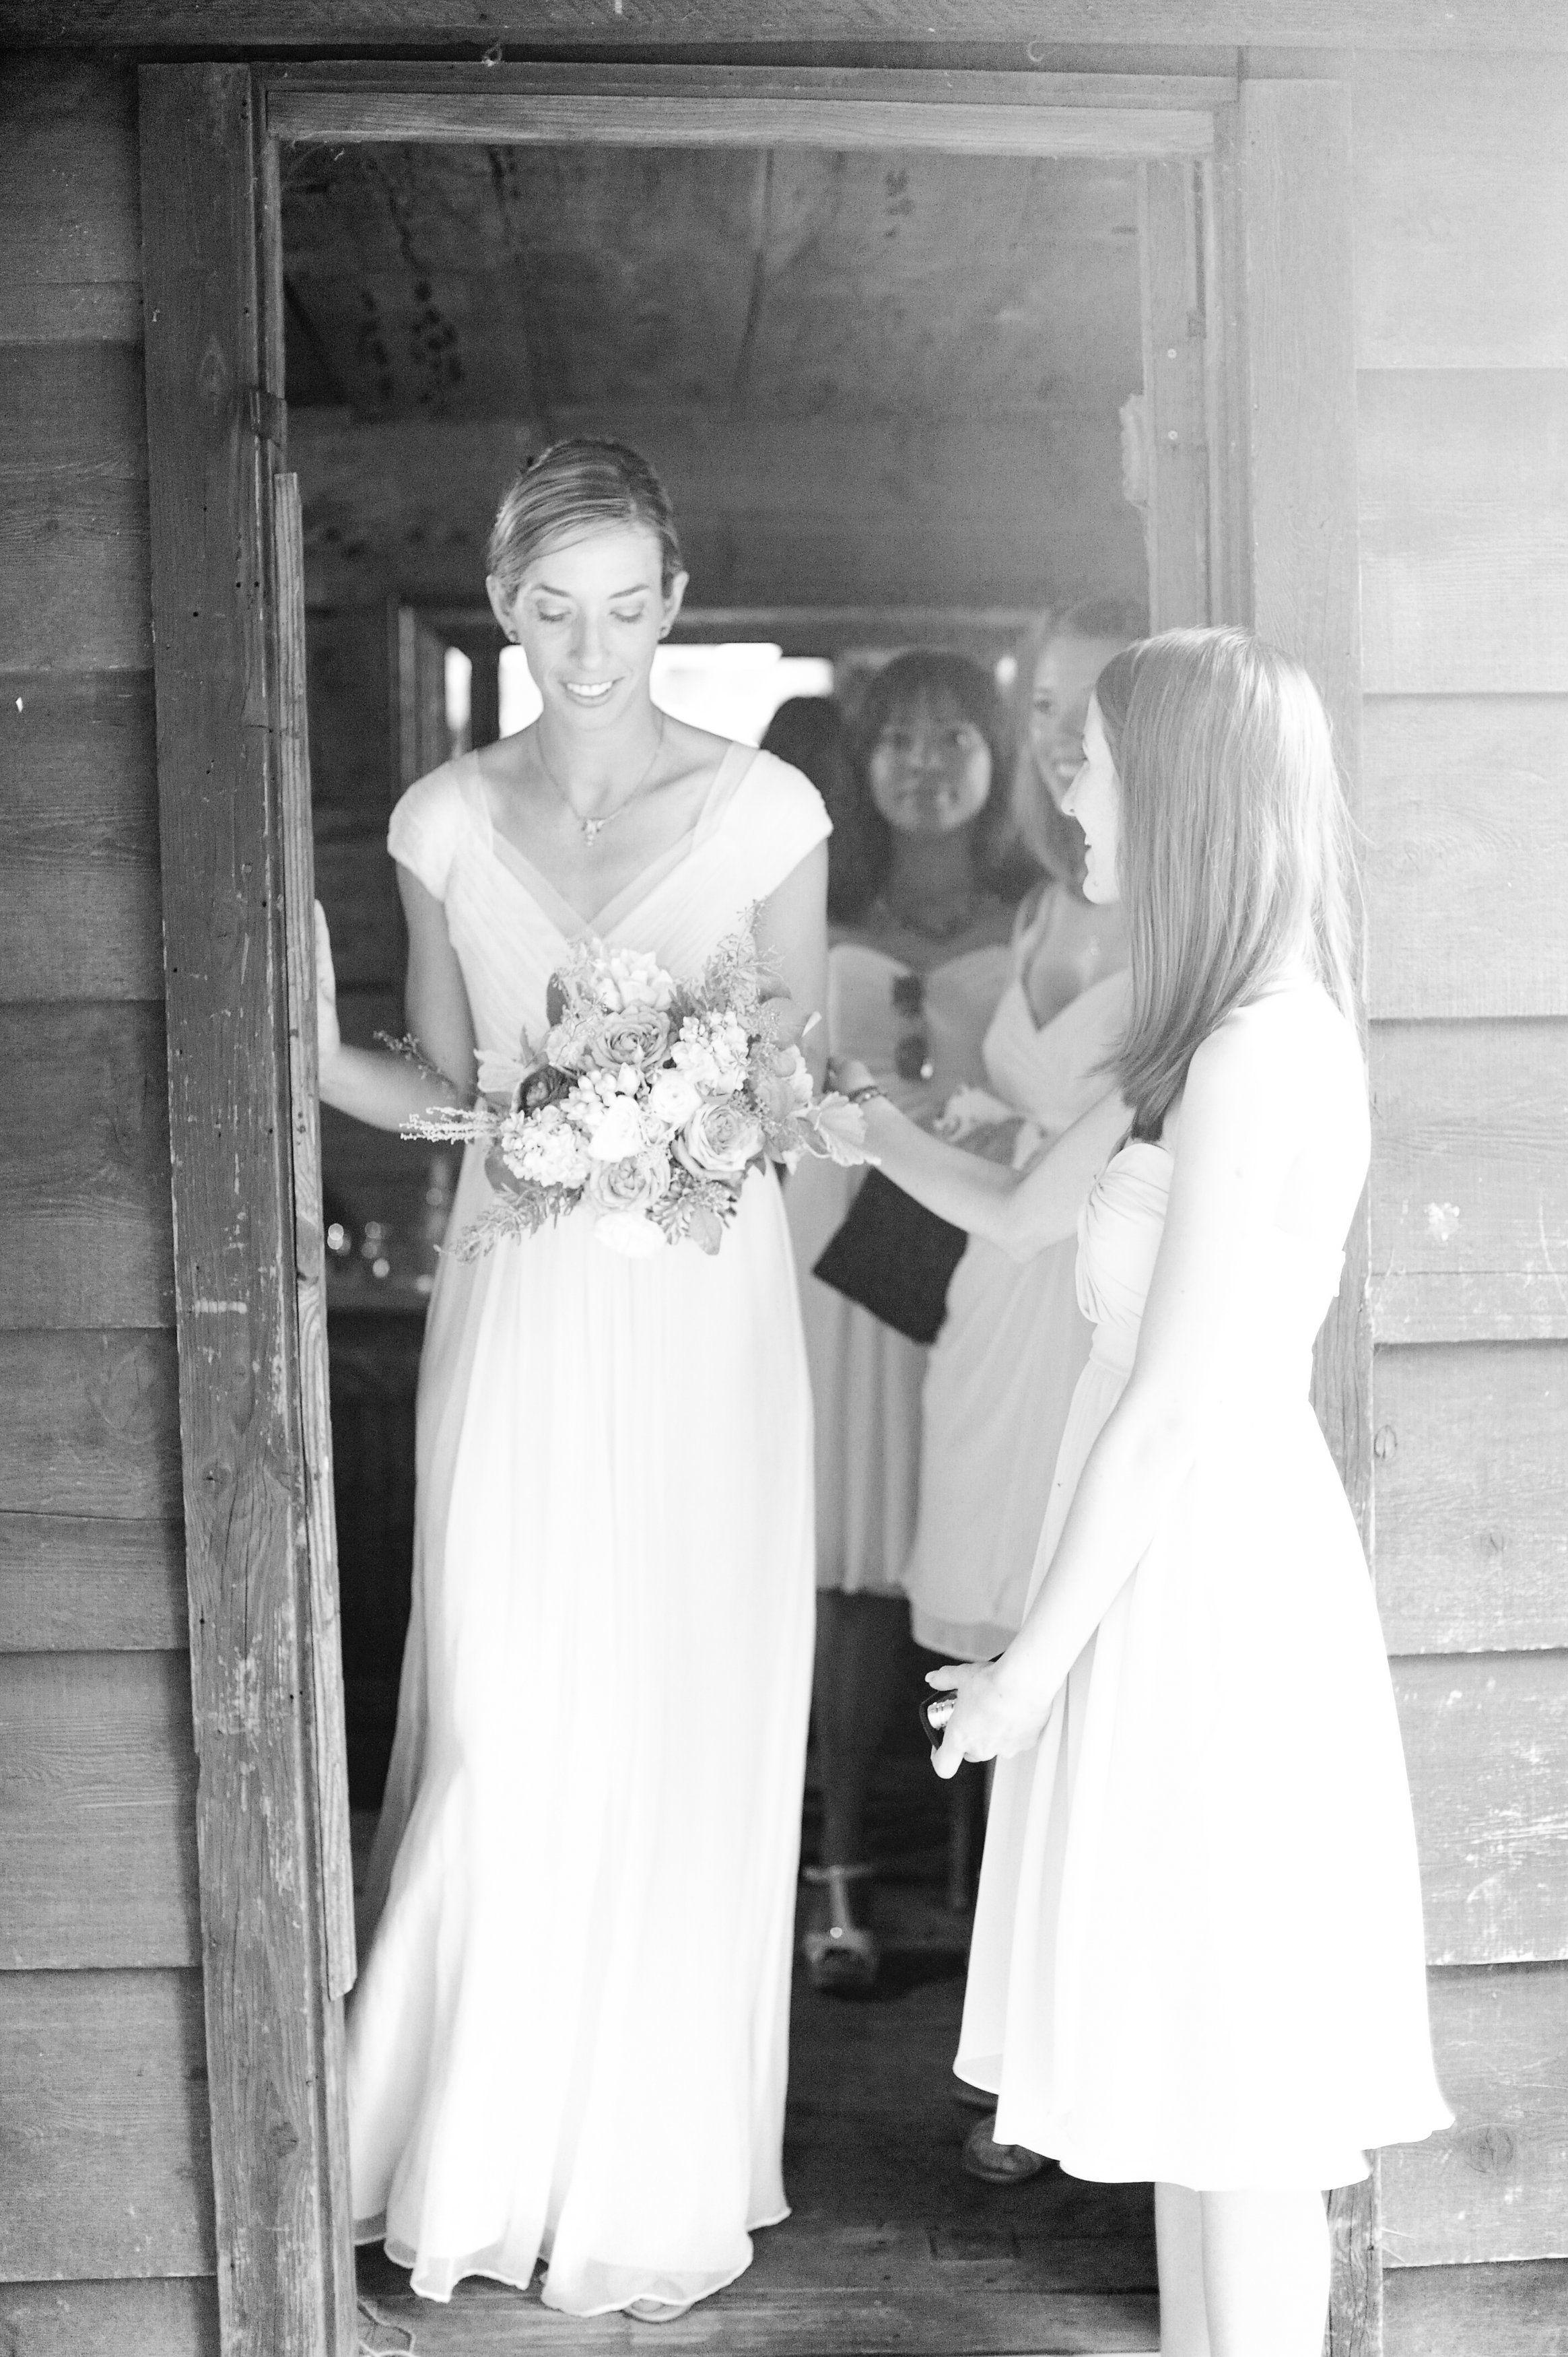 Hb wedding dress weddings and traditional wedding dresses